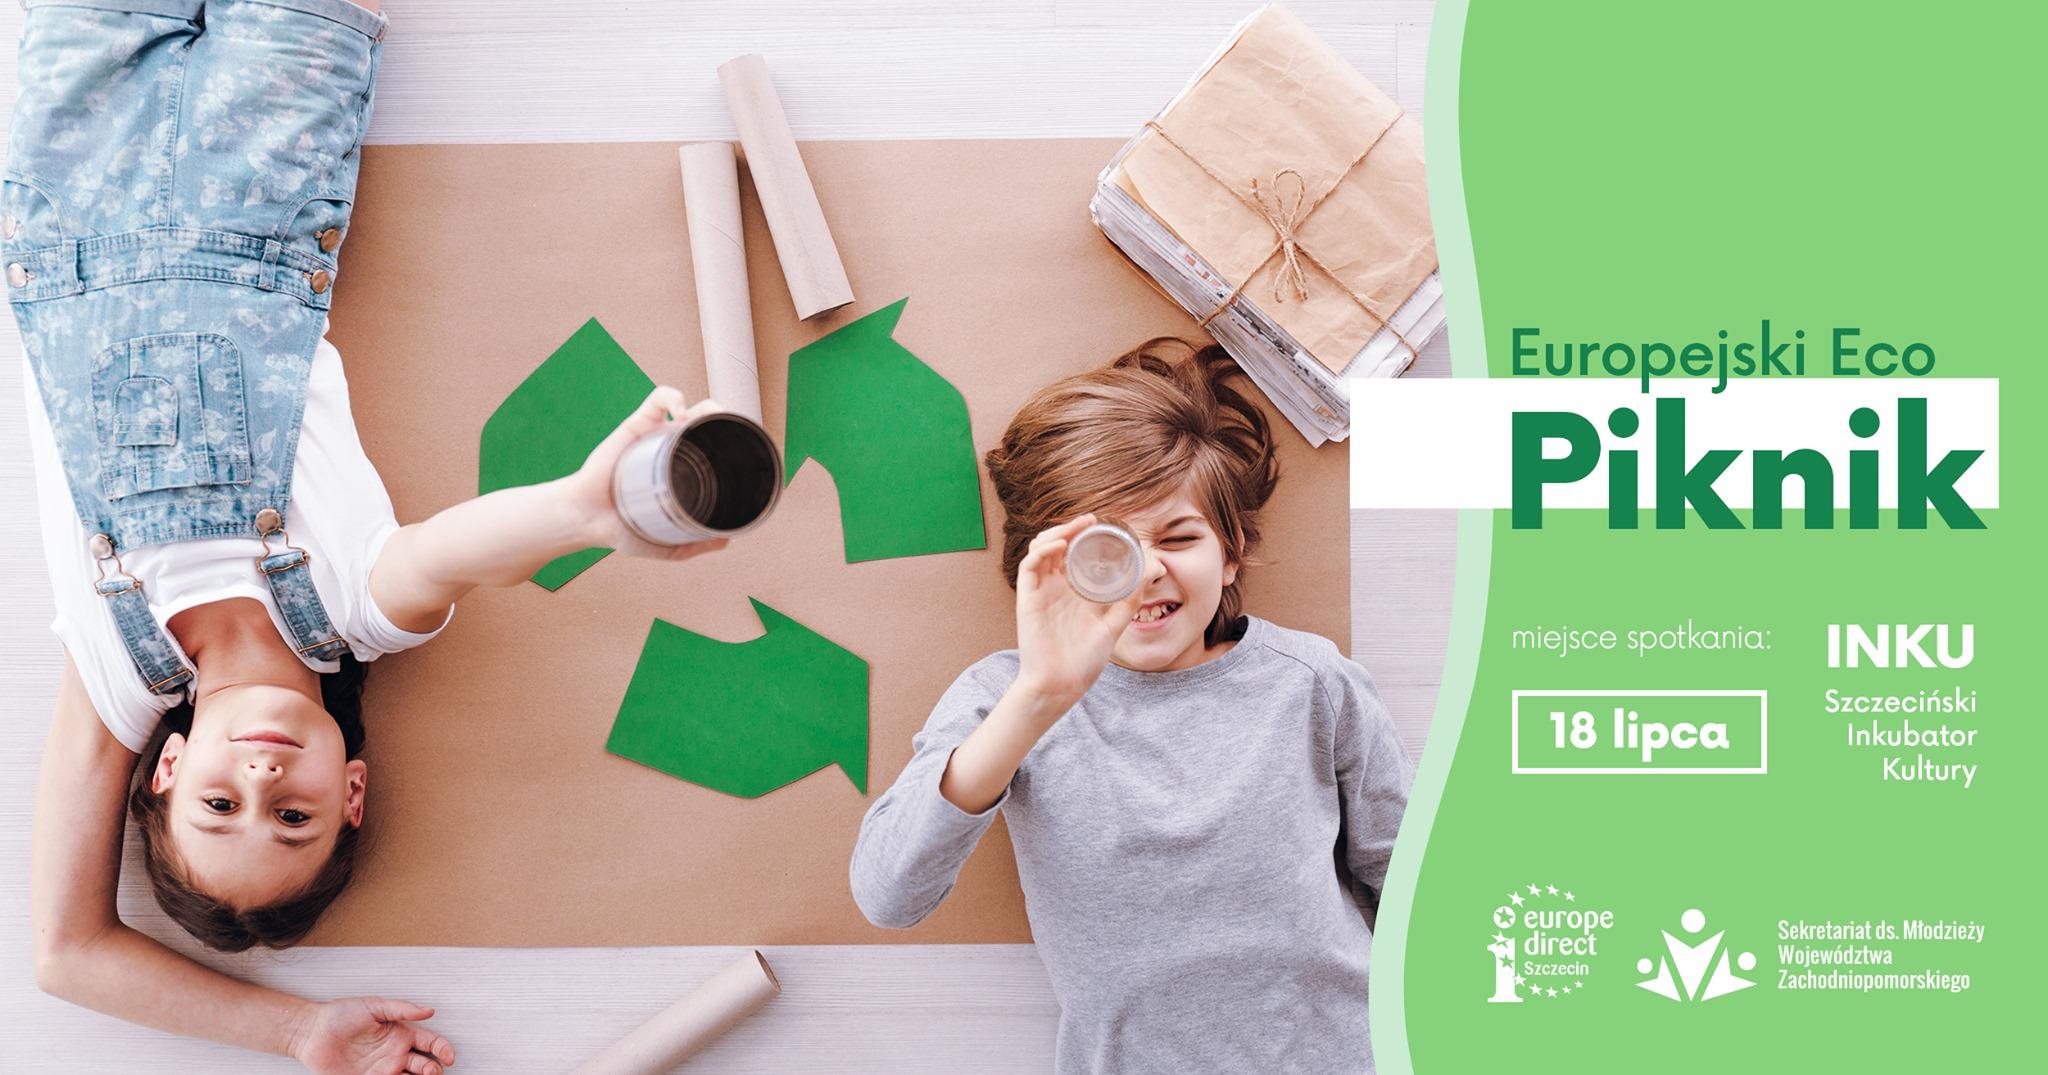 Europejski Eco Piknik